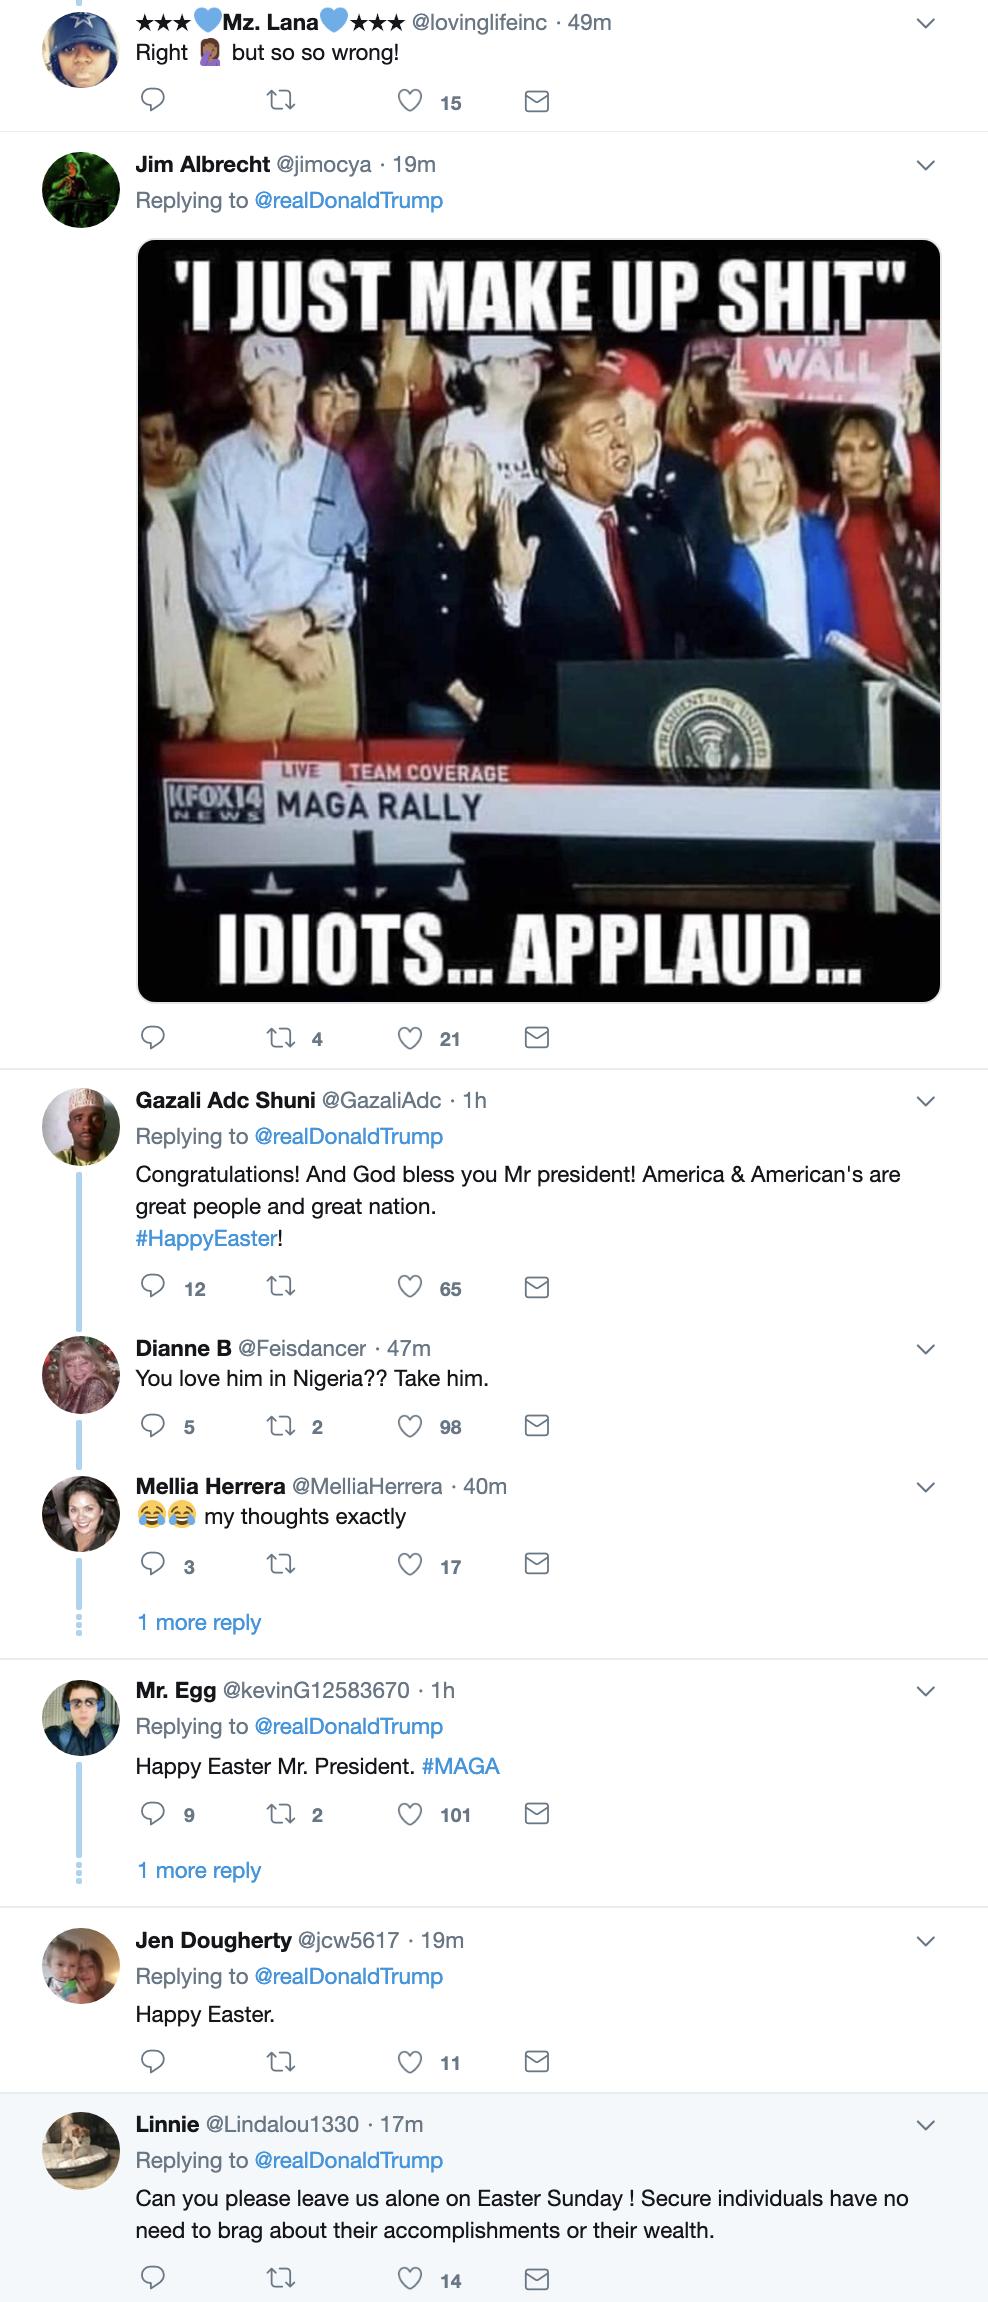 Screen-Shot-2019-04-21-at-7.08.10-AM Trump Wakes Up & Suffers 5-Tweet Easter Sunday Mental Collapse Corruption Crime Donald Trump Investigation Mueller Politics Robert Mueller Russia Top Stories